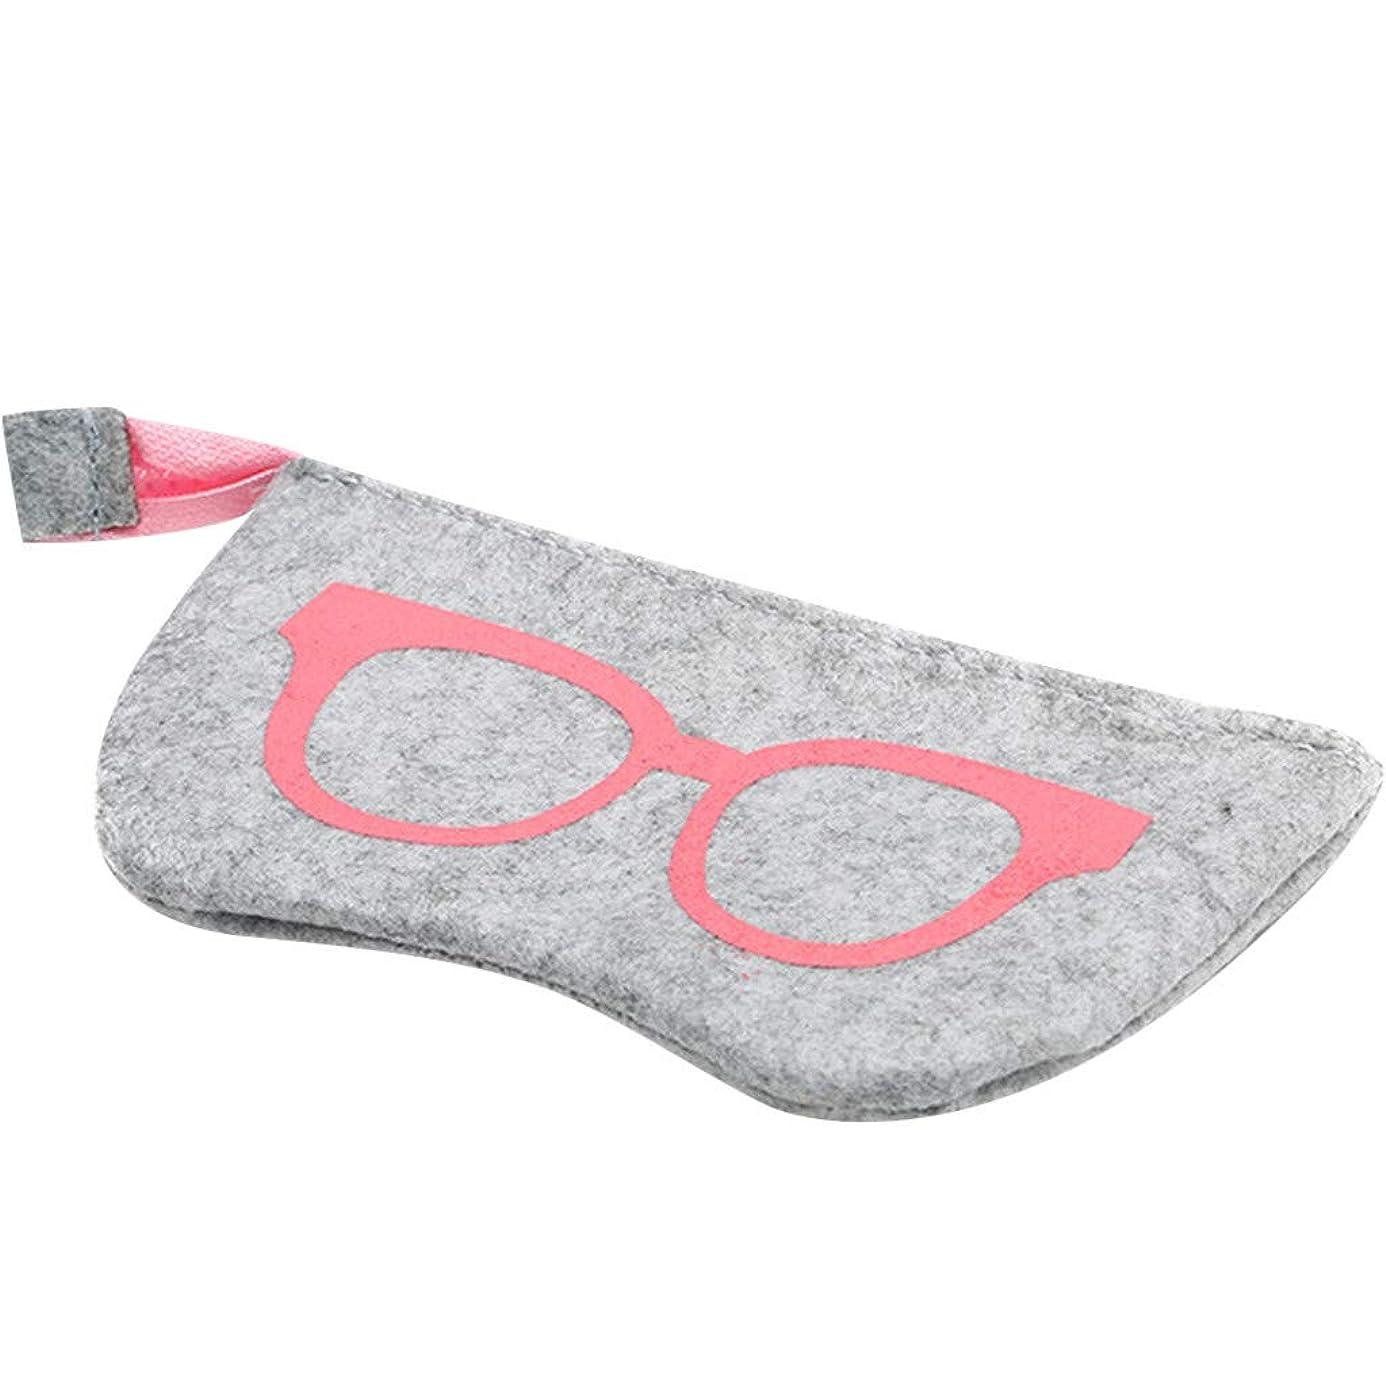 ?LOVESOO? Portable Zipper Soft Case Eyesglasses Box Multi-Function Pouch Purse Bag Sunglasses Soft Case